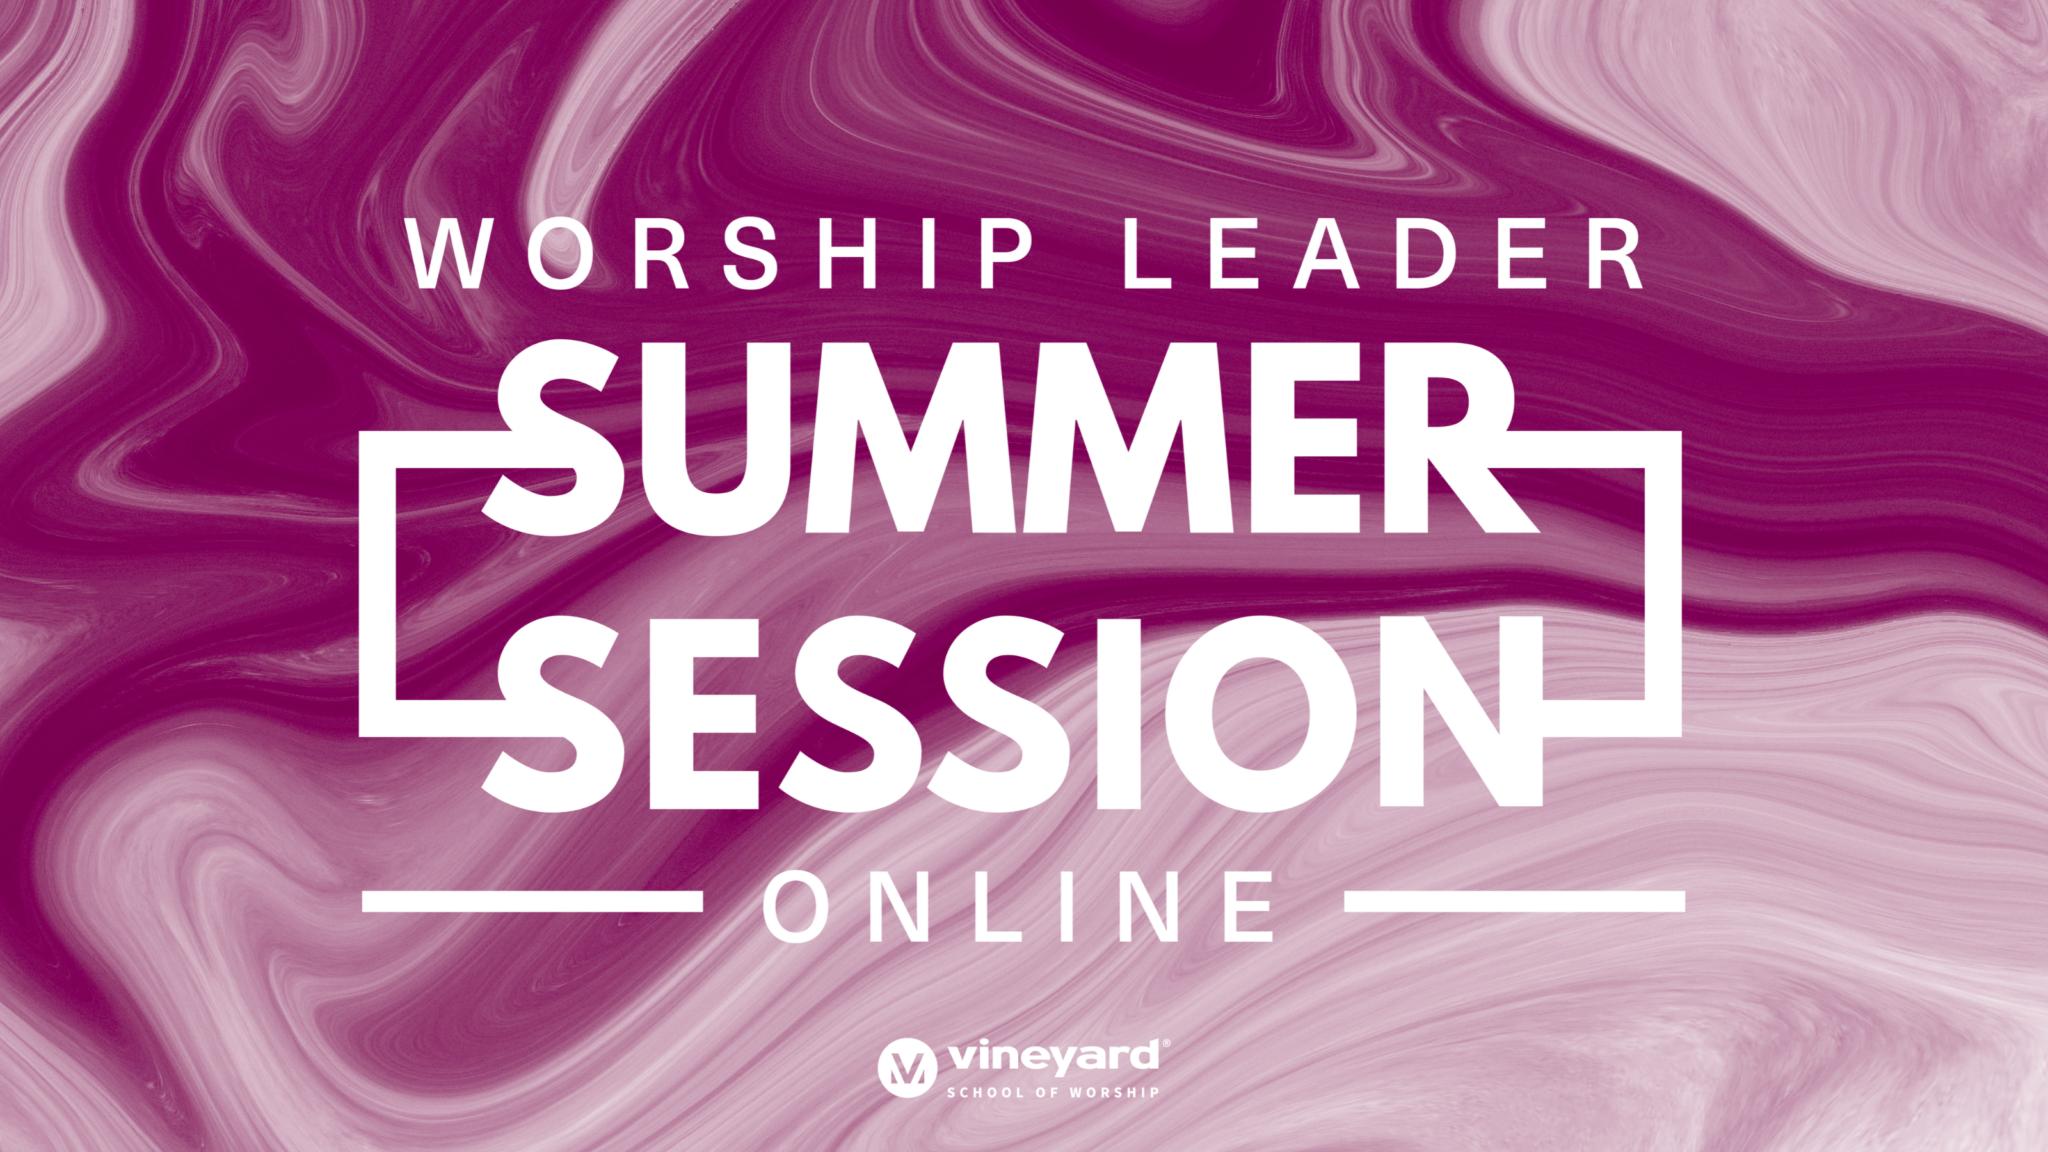 Vineyard School Of Worship: Worship Leader Summer Session (Online)